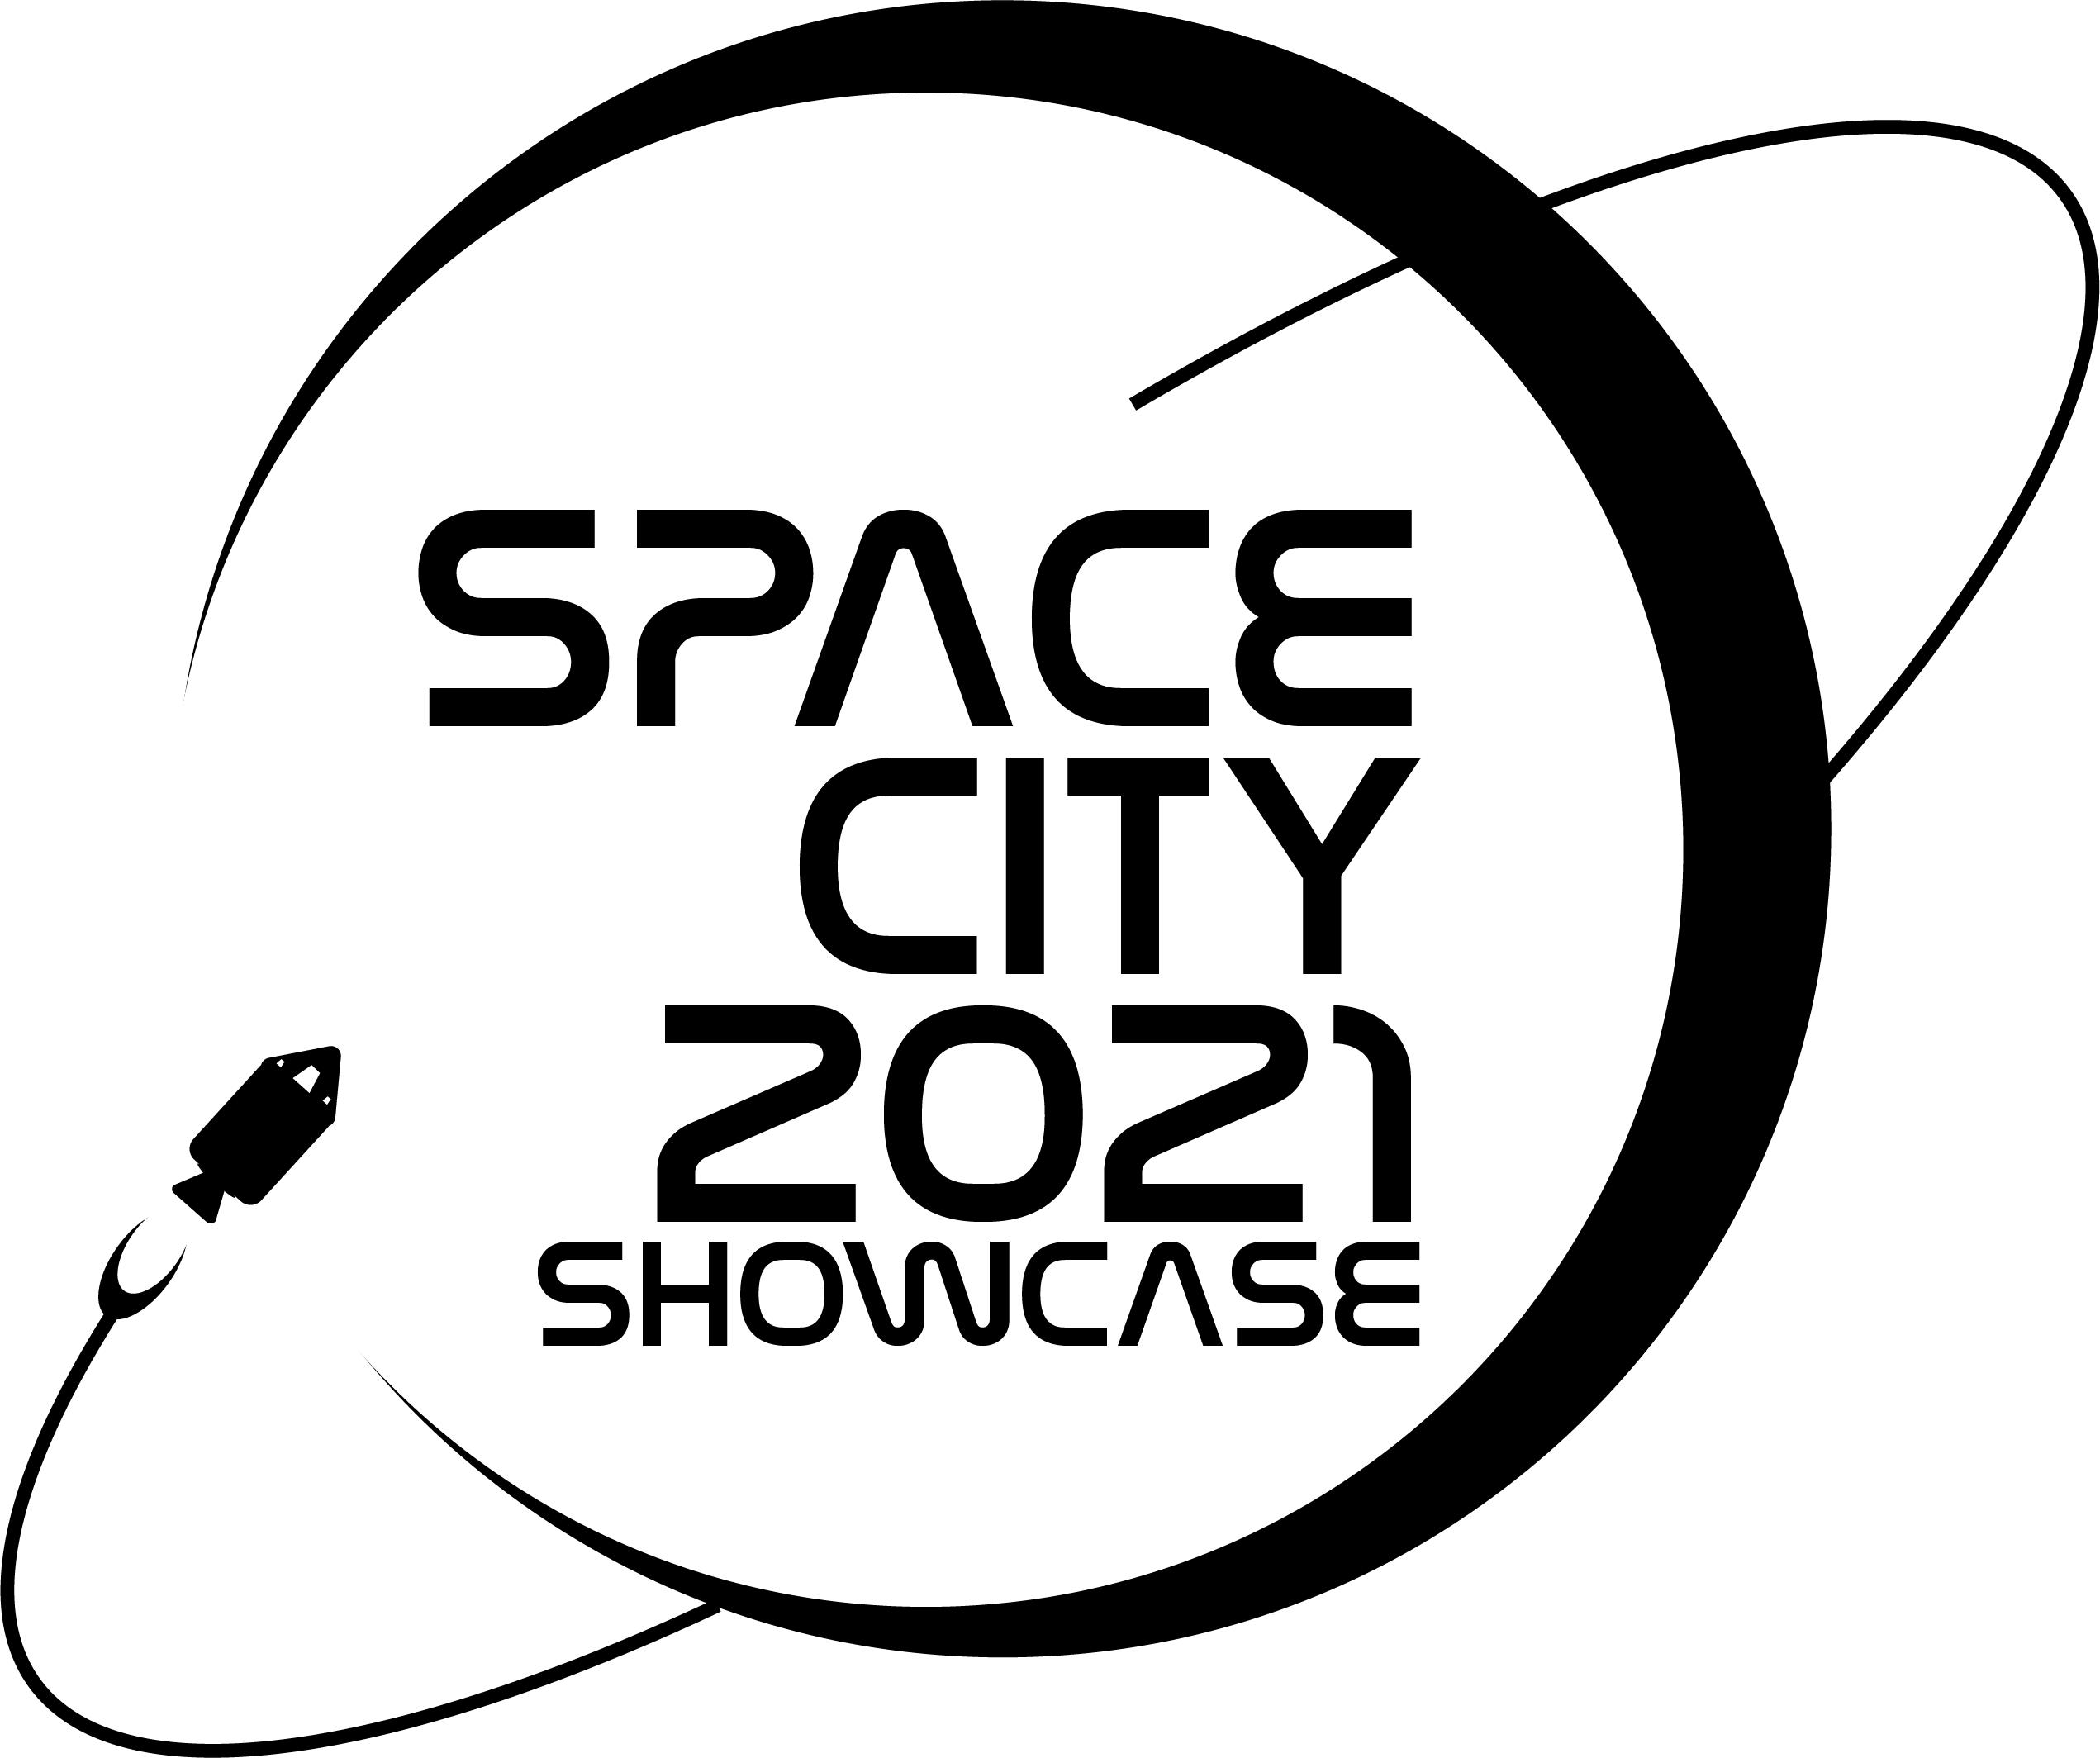 Showcase: Space City VRC High School